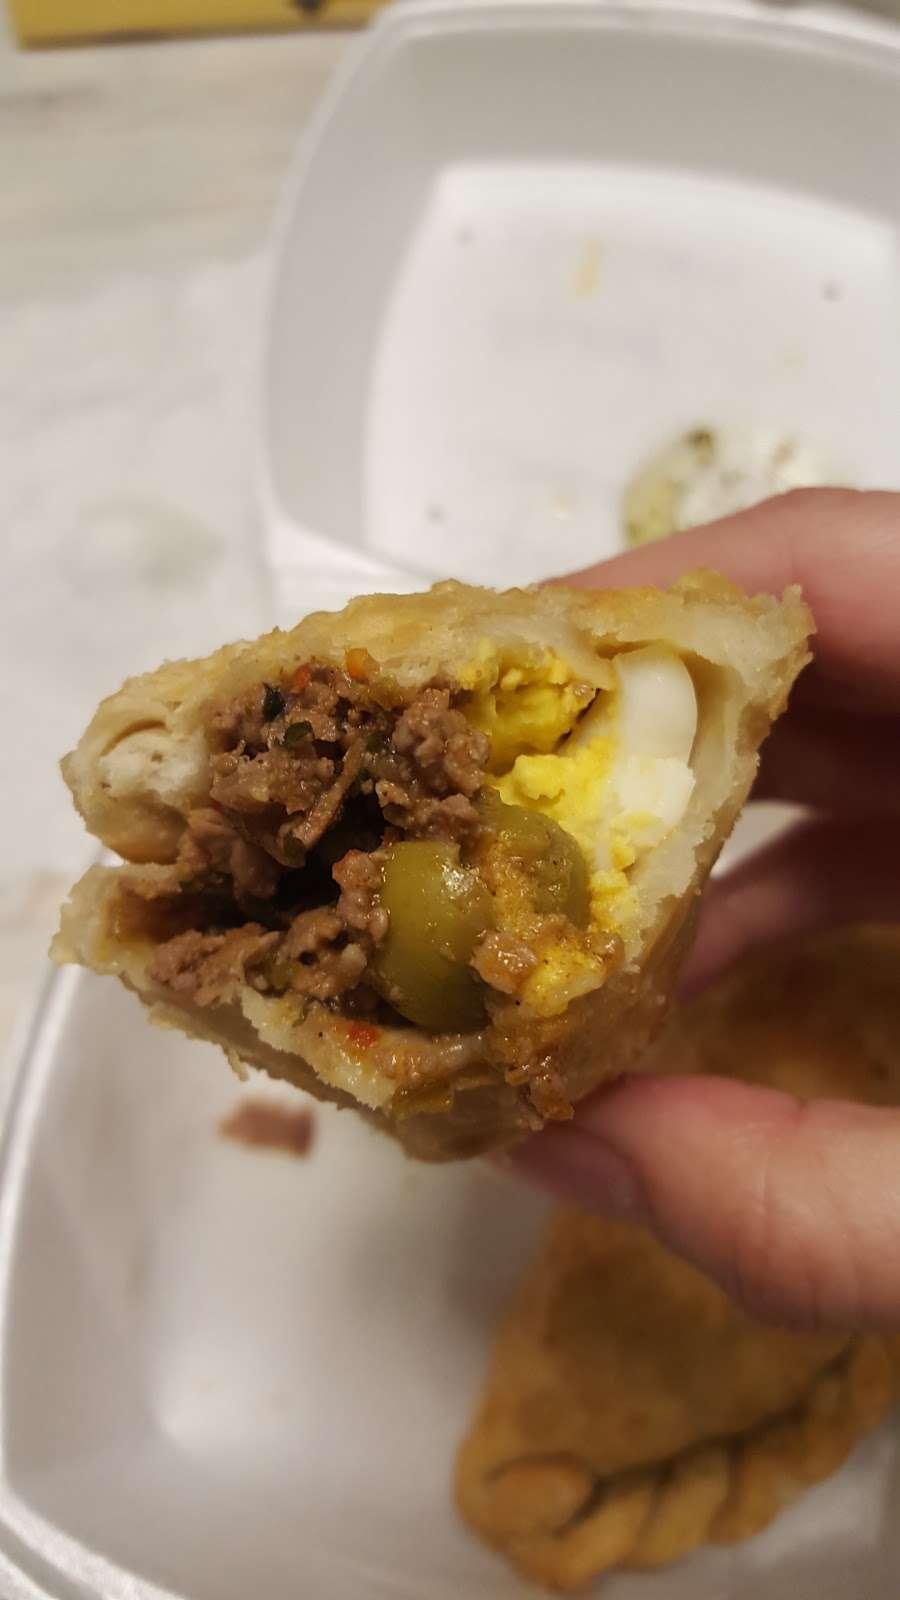 Empanadas To Go - restaurant  | Photo 10 of 10 | Address: 12345 Mountain Ave d, Chino, CA 91710, USA | Phone: (909) 591-1140